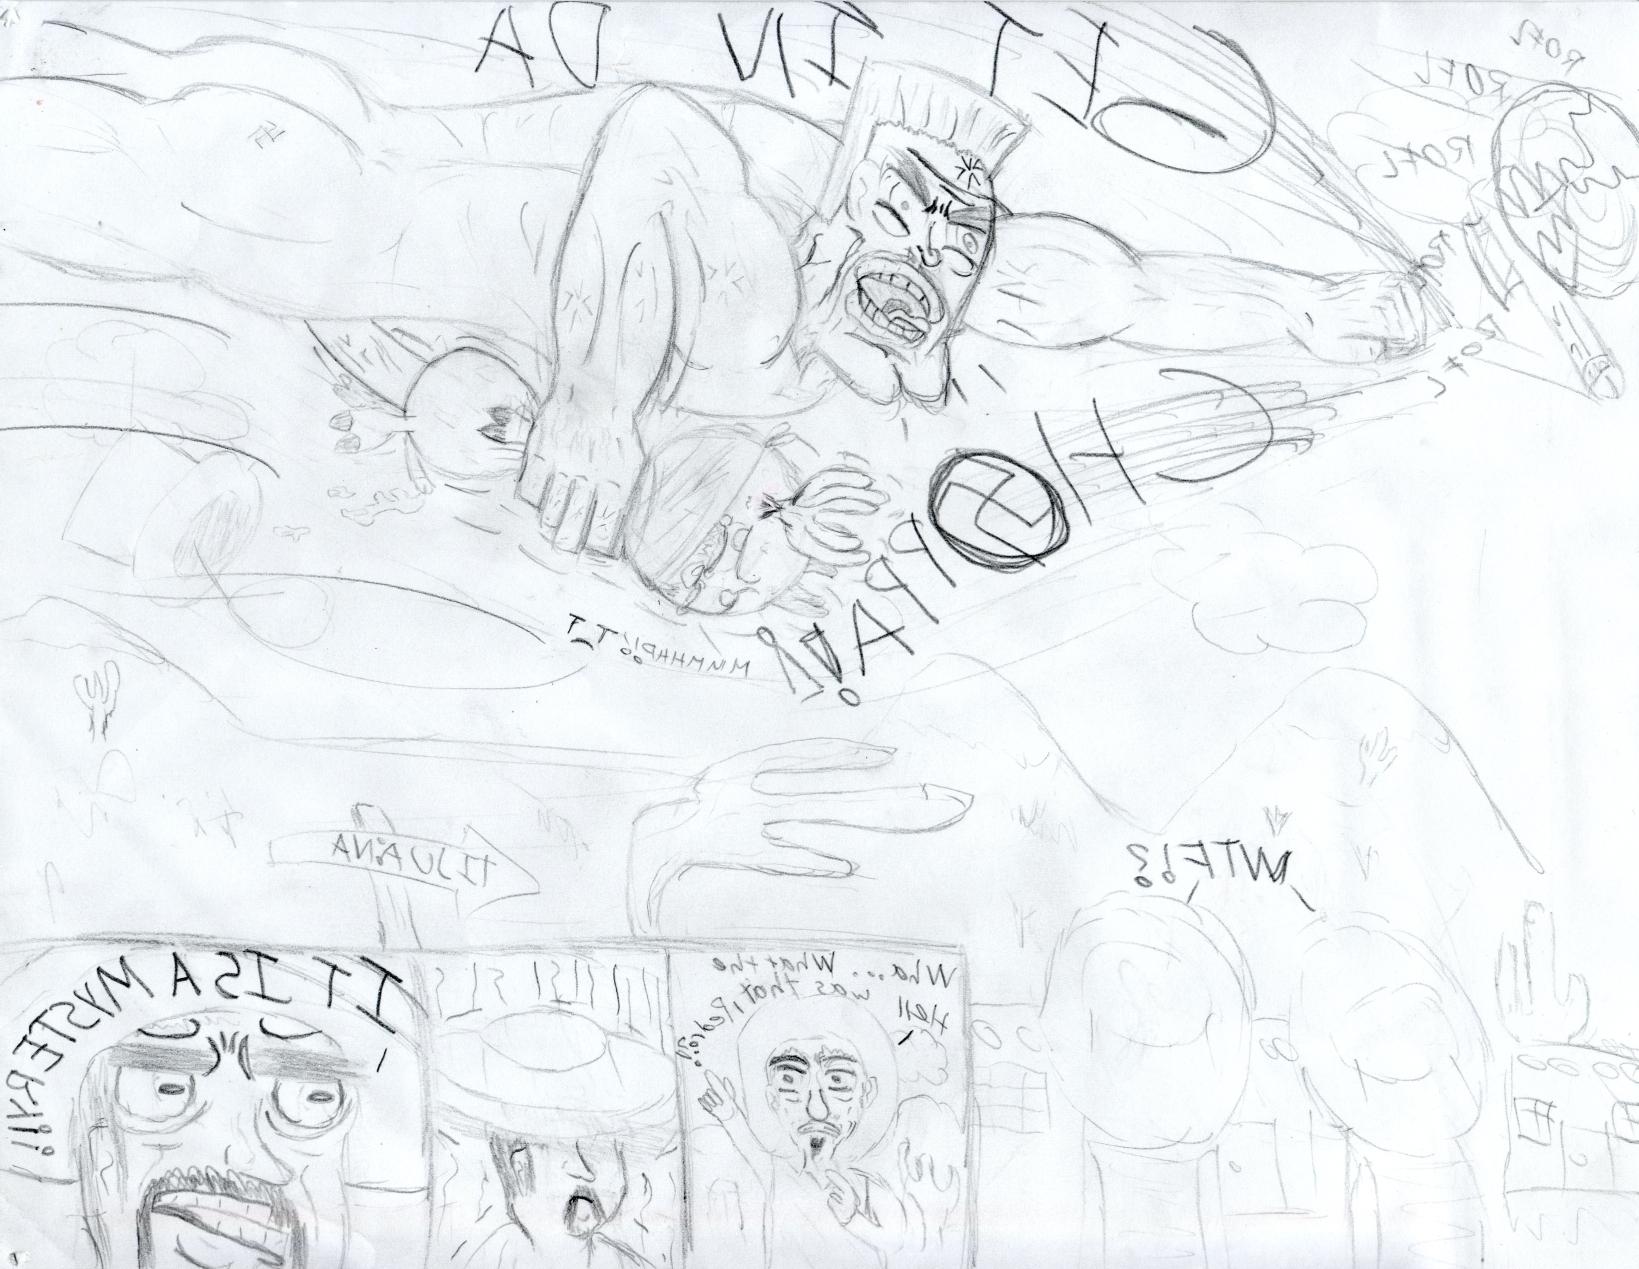 Toon sex pic ##000130818072 arnold schwarzenegger chopper one piece tagme